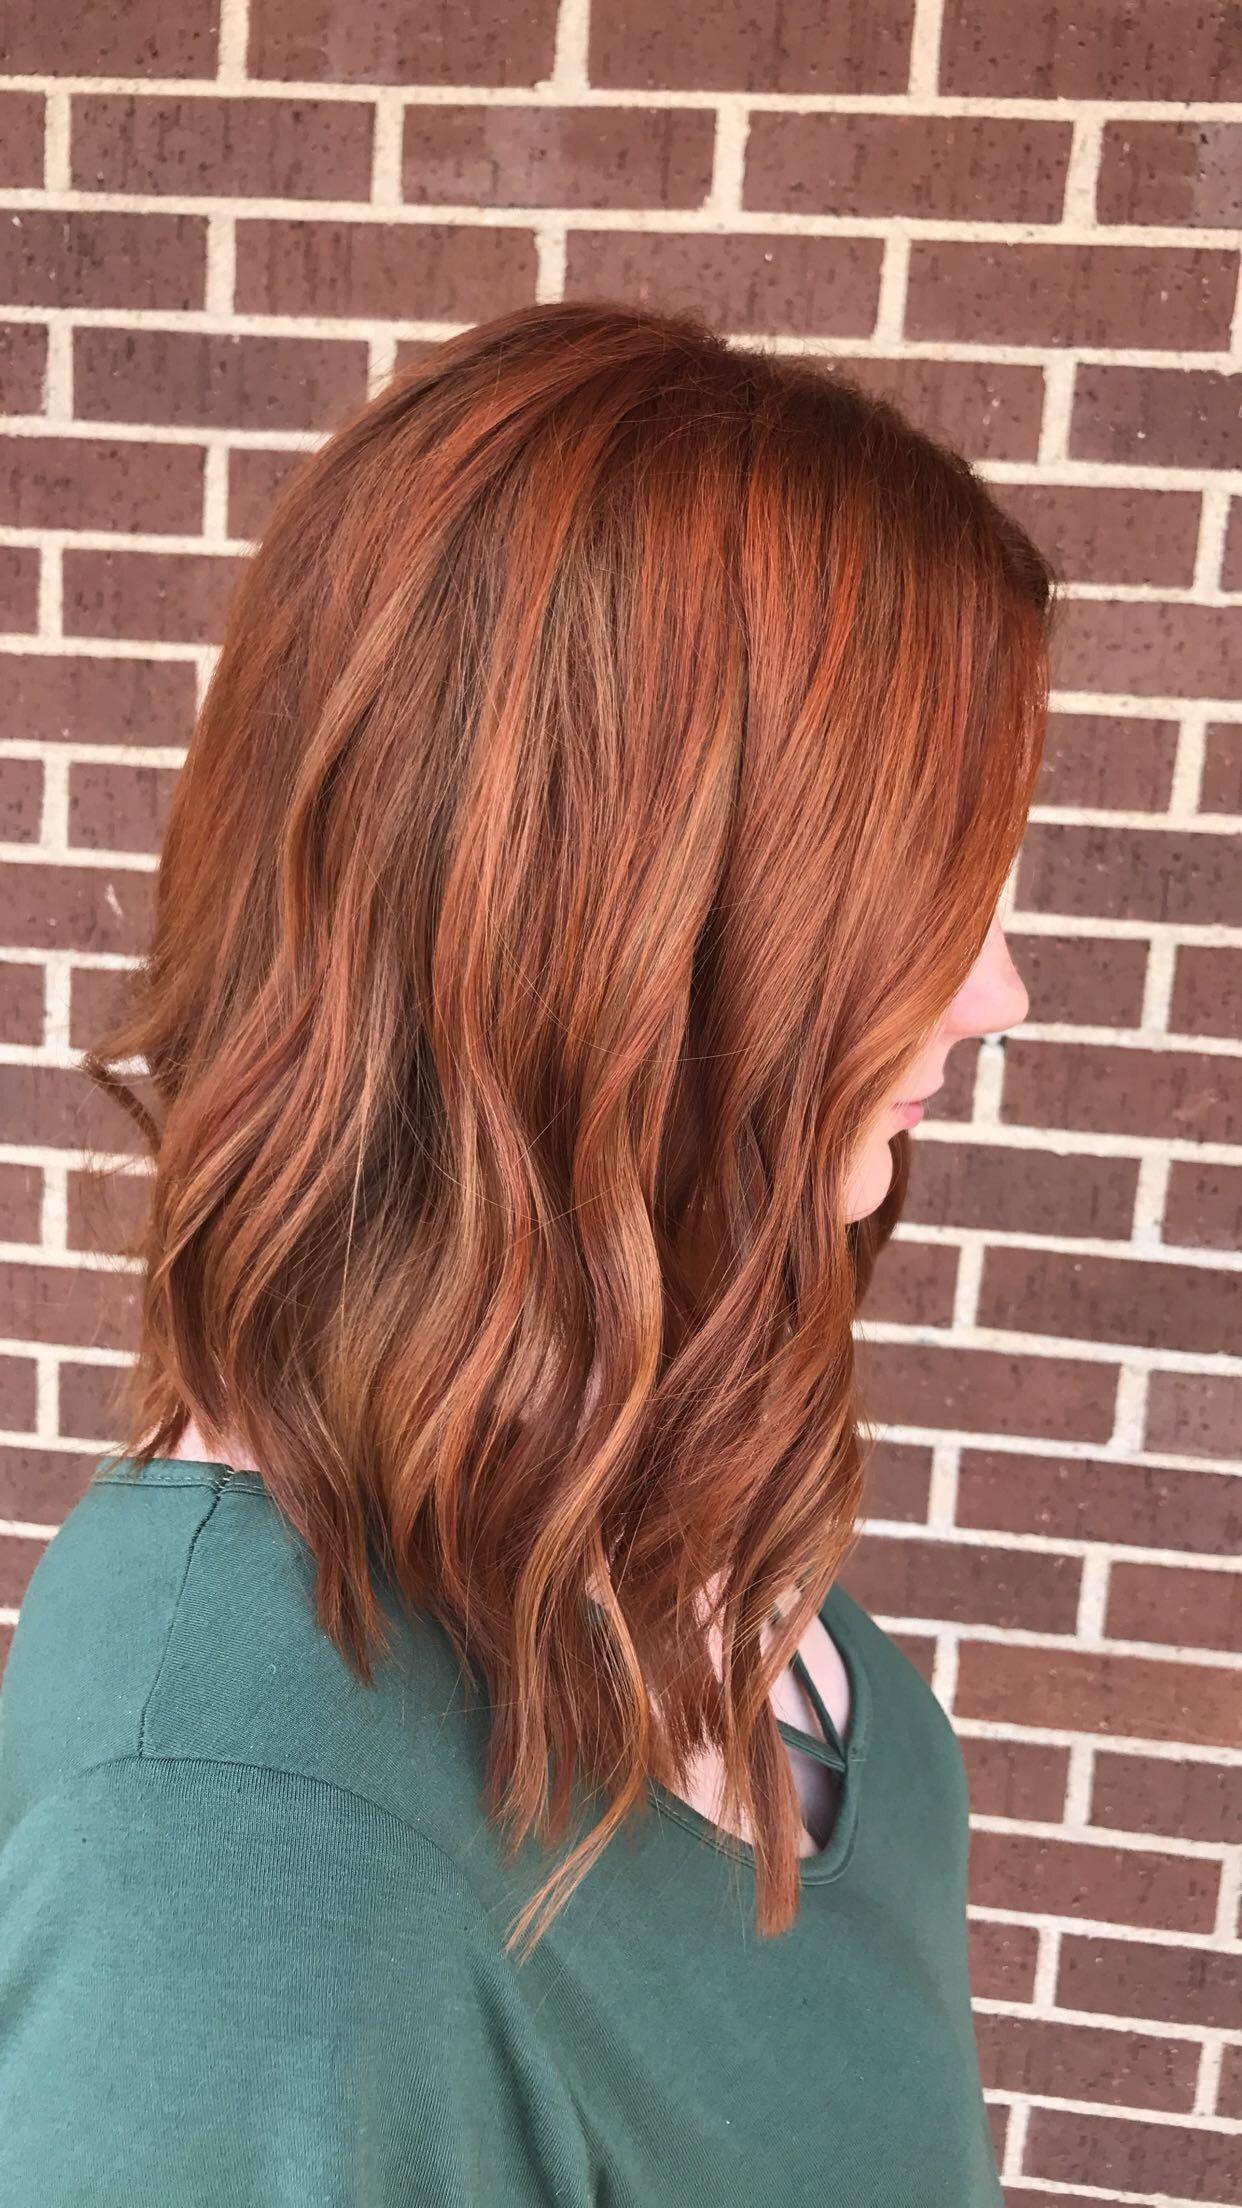 Cooper red hair Long bob cut Hair Pinterest